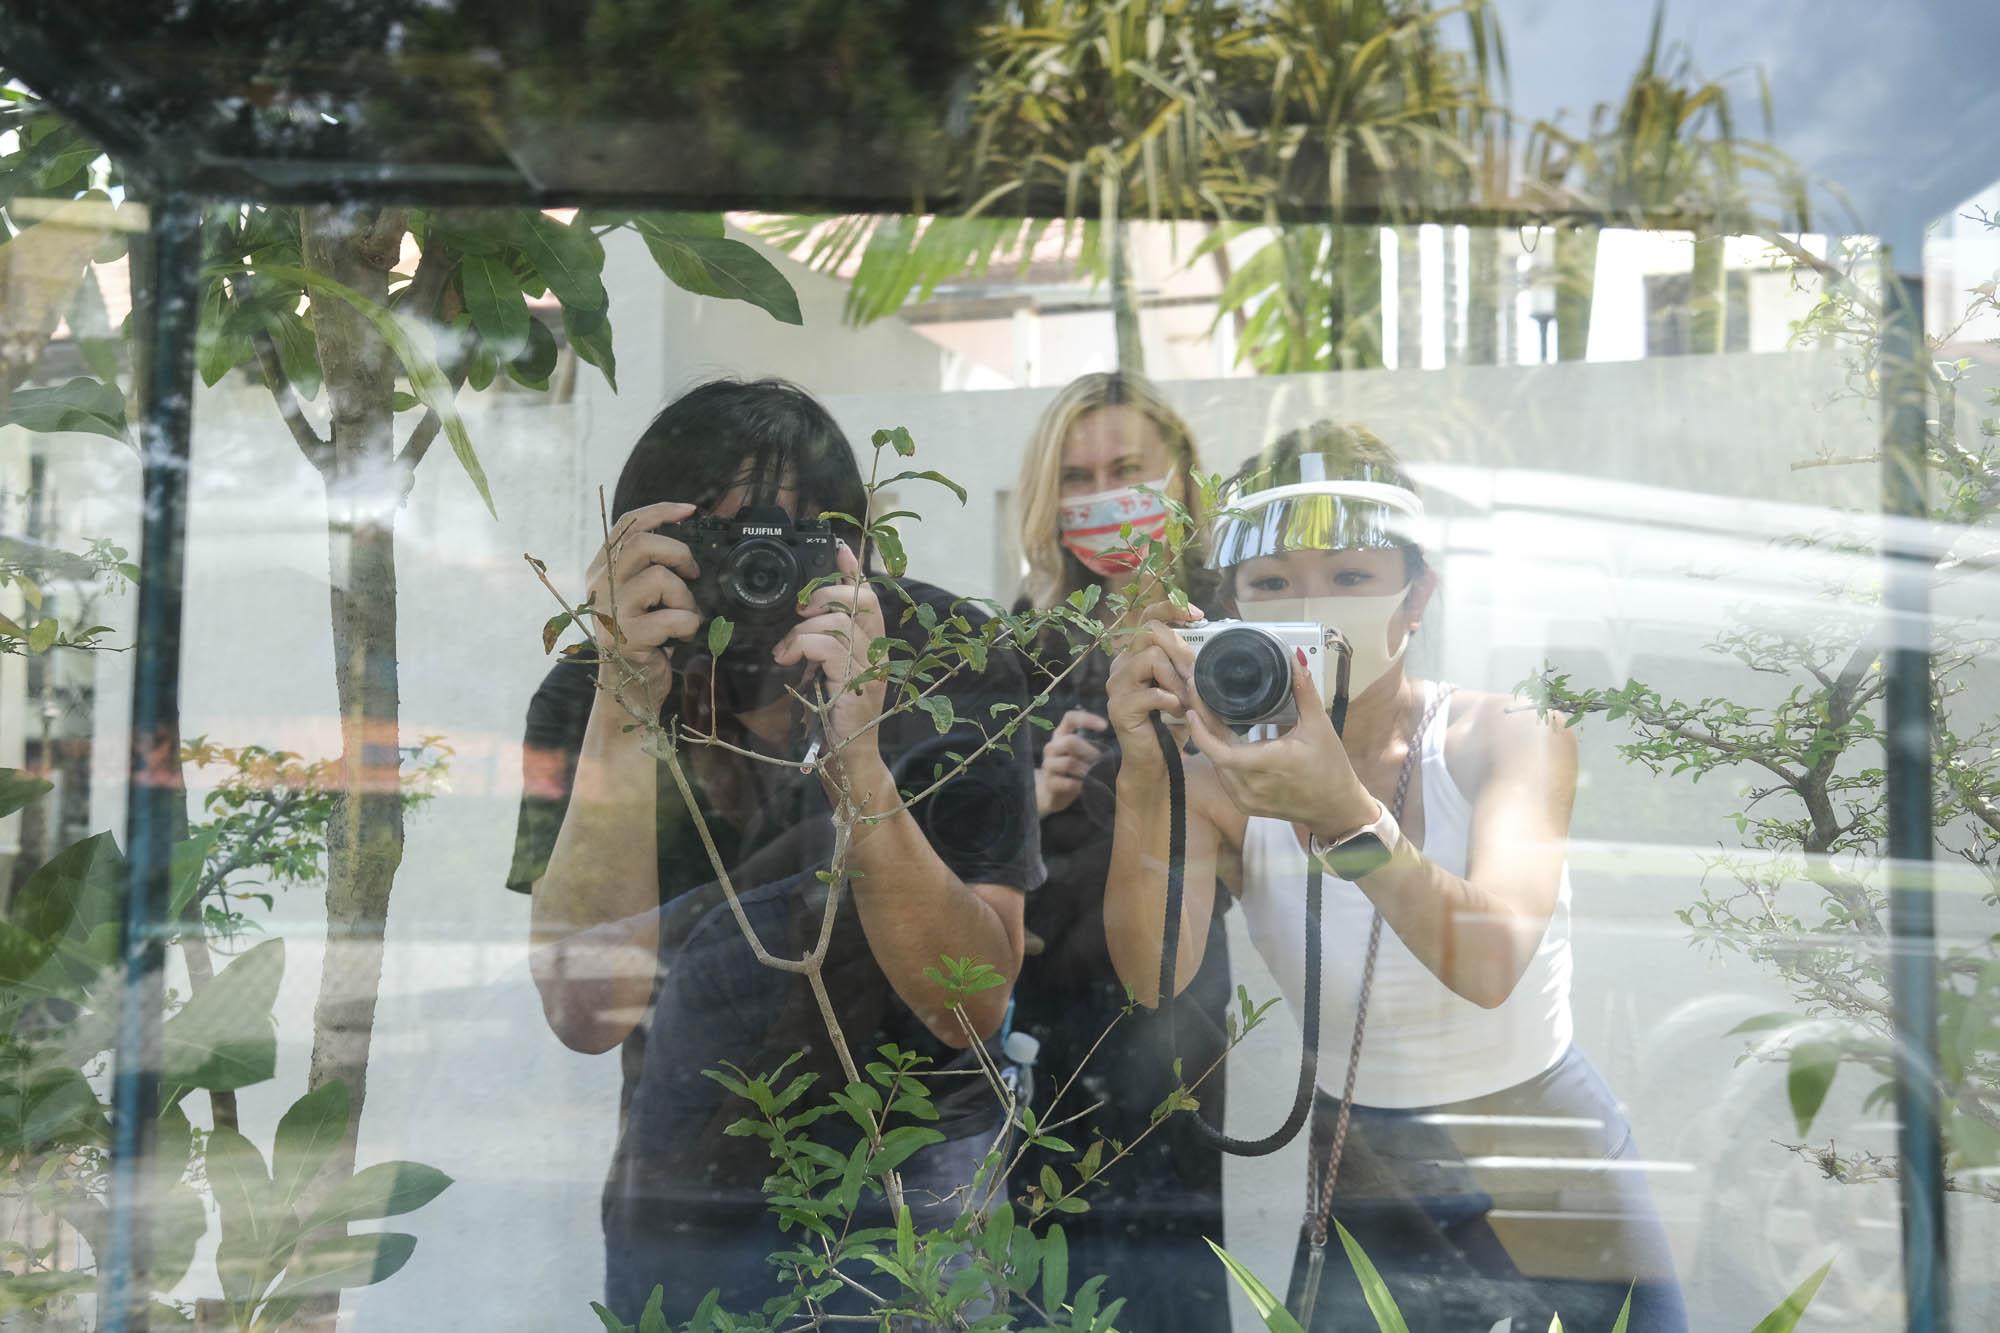 Photowalk with FUJIFILM Photography Workshop Singapore COCO Creative Studio 40